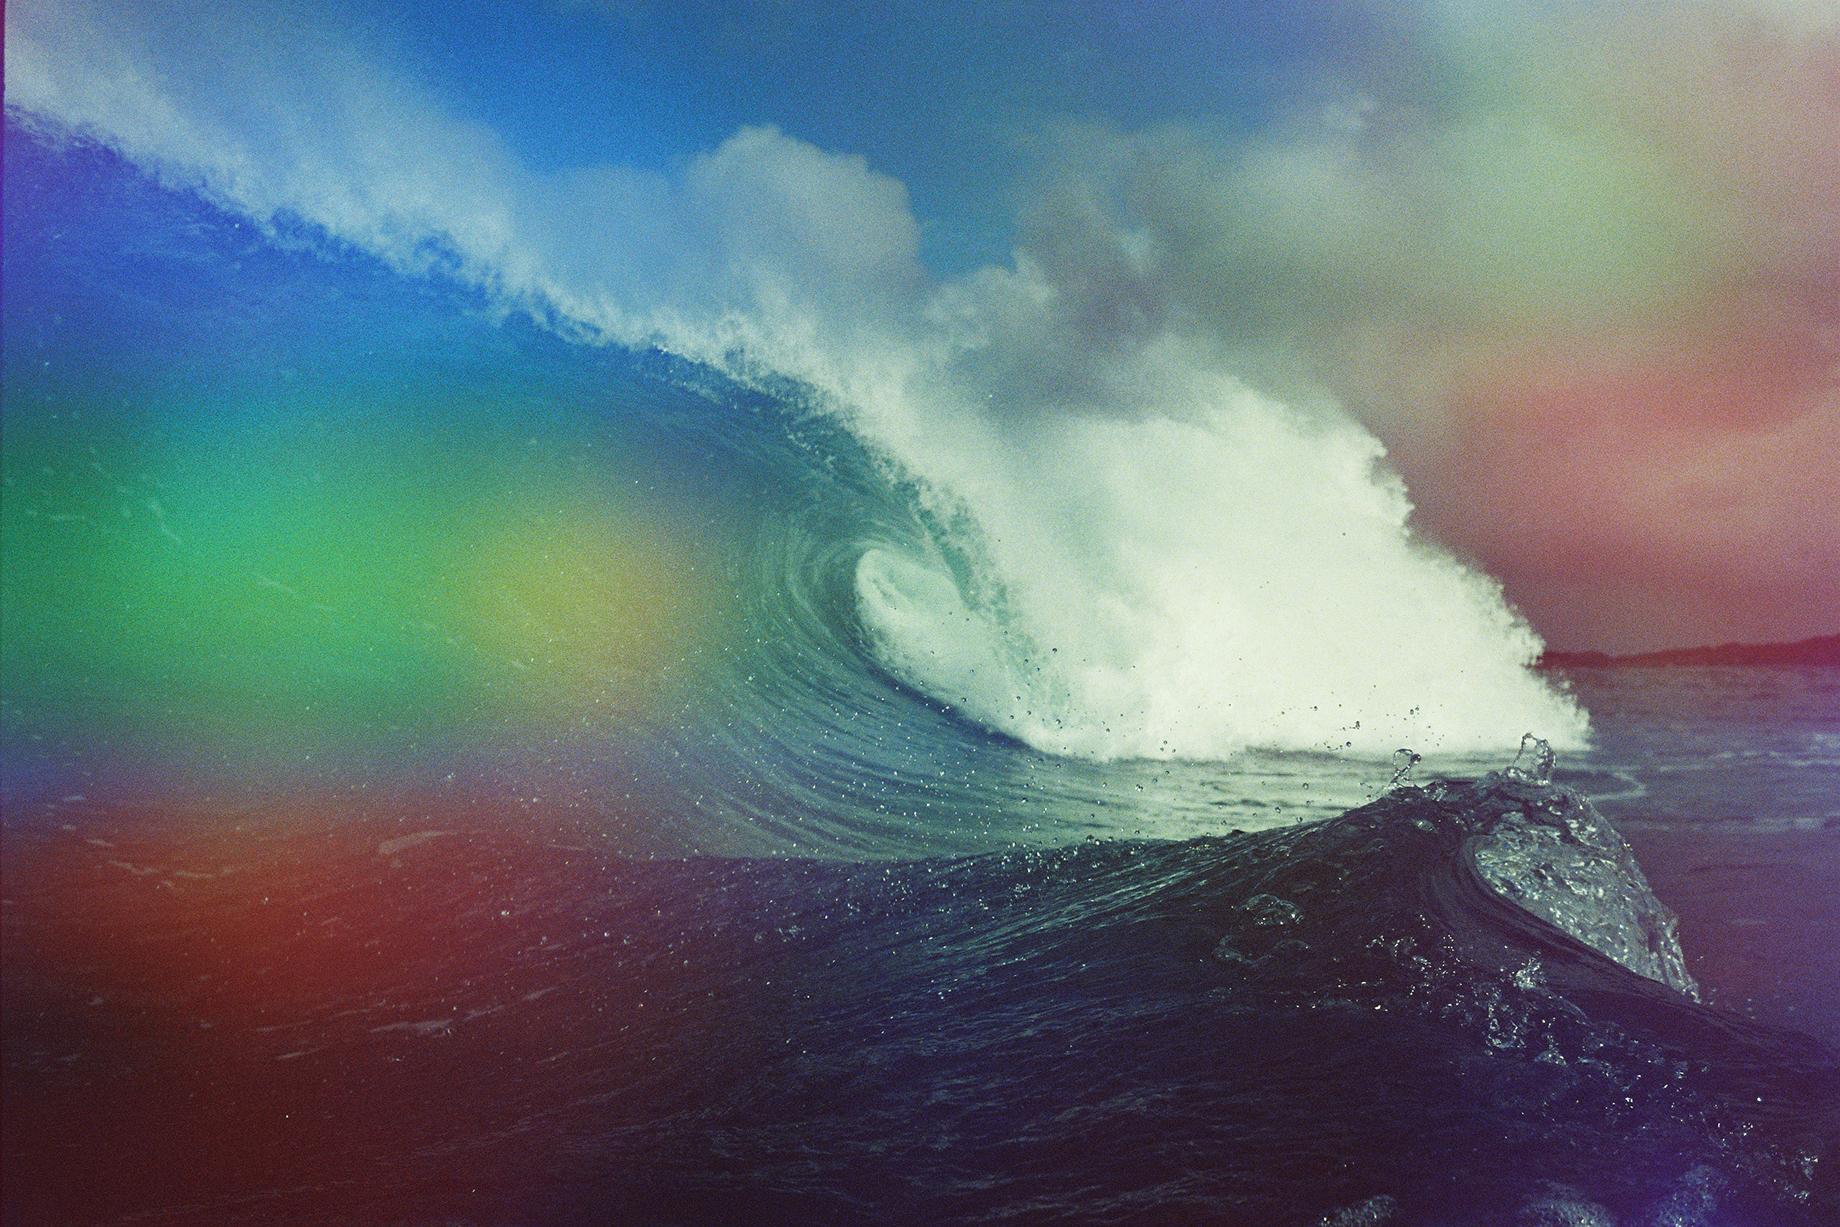 Salt Water Australia surf LG psyche